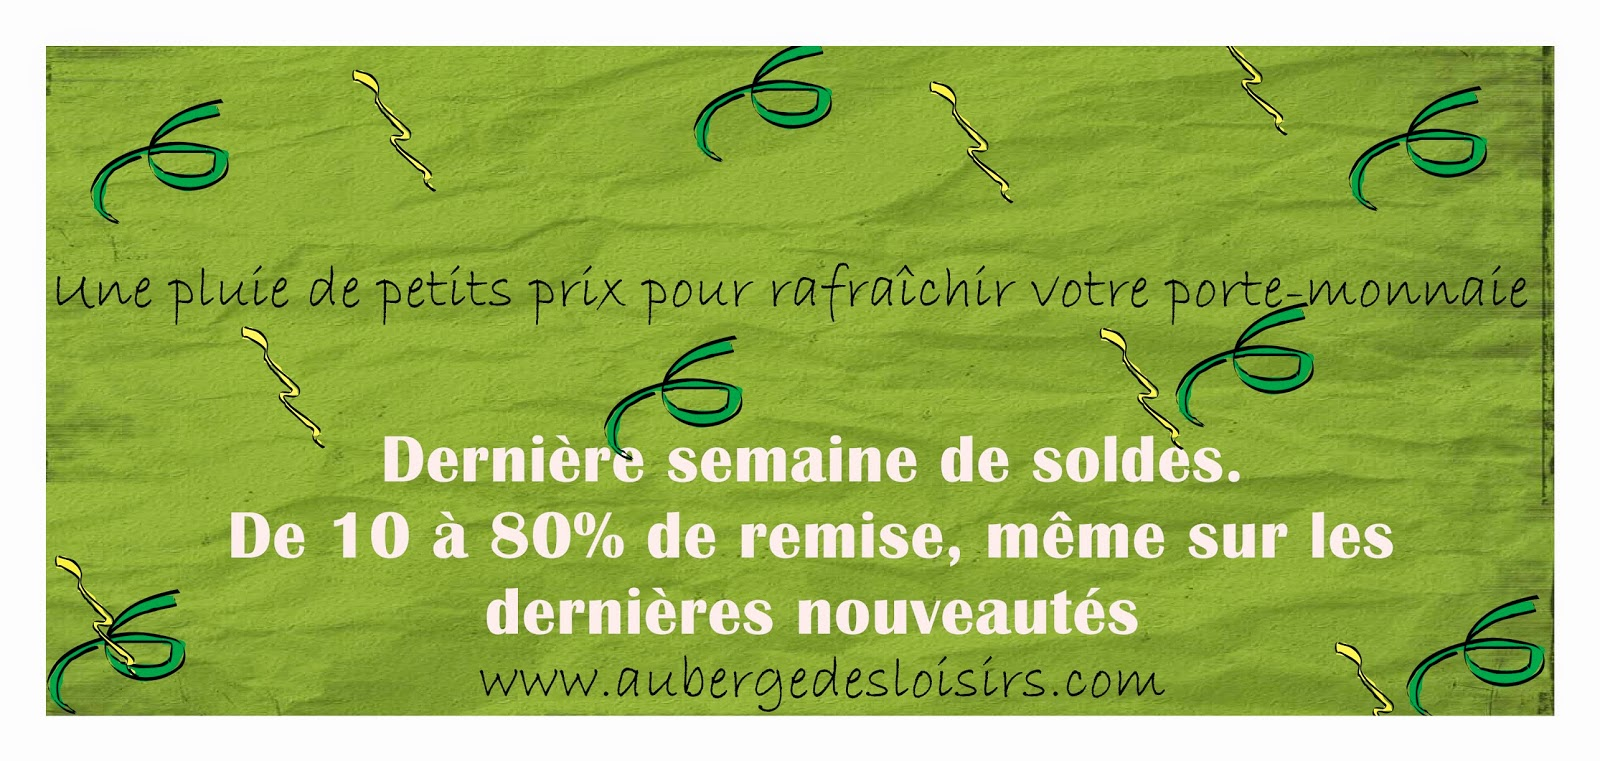 http://www.aubergedesloisirs.com/157-soldes-ete